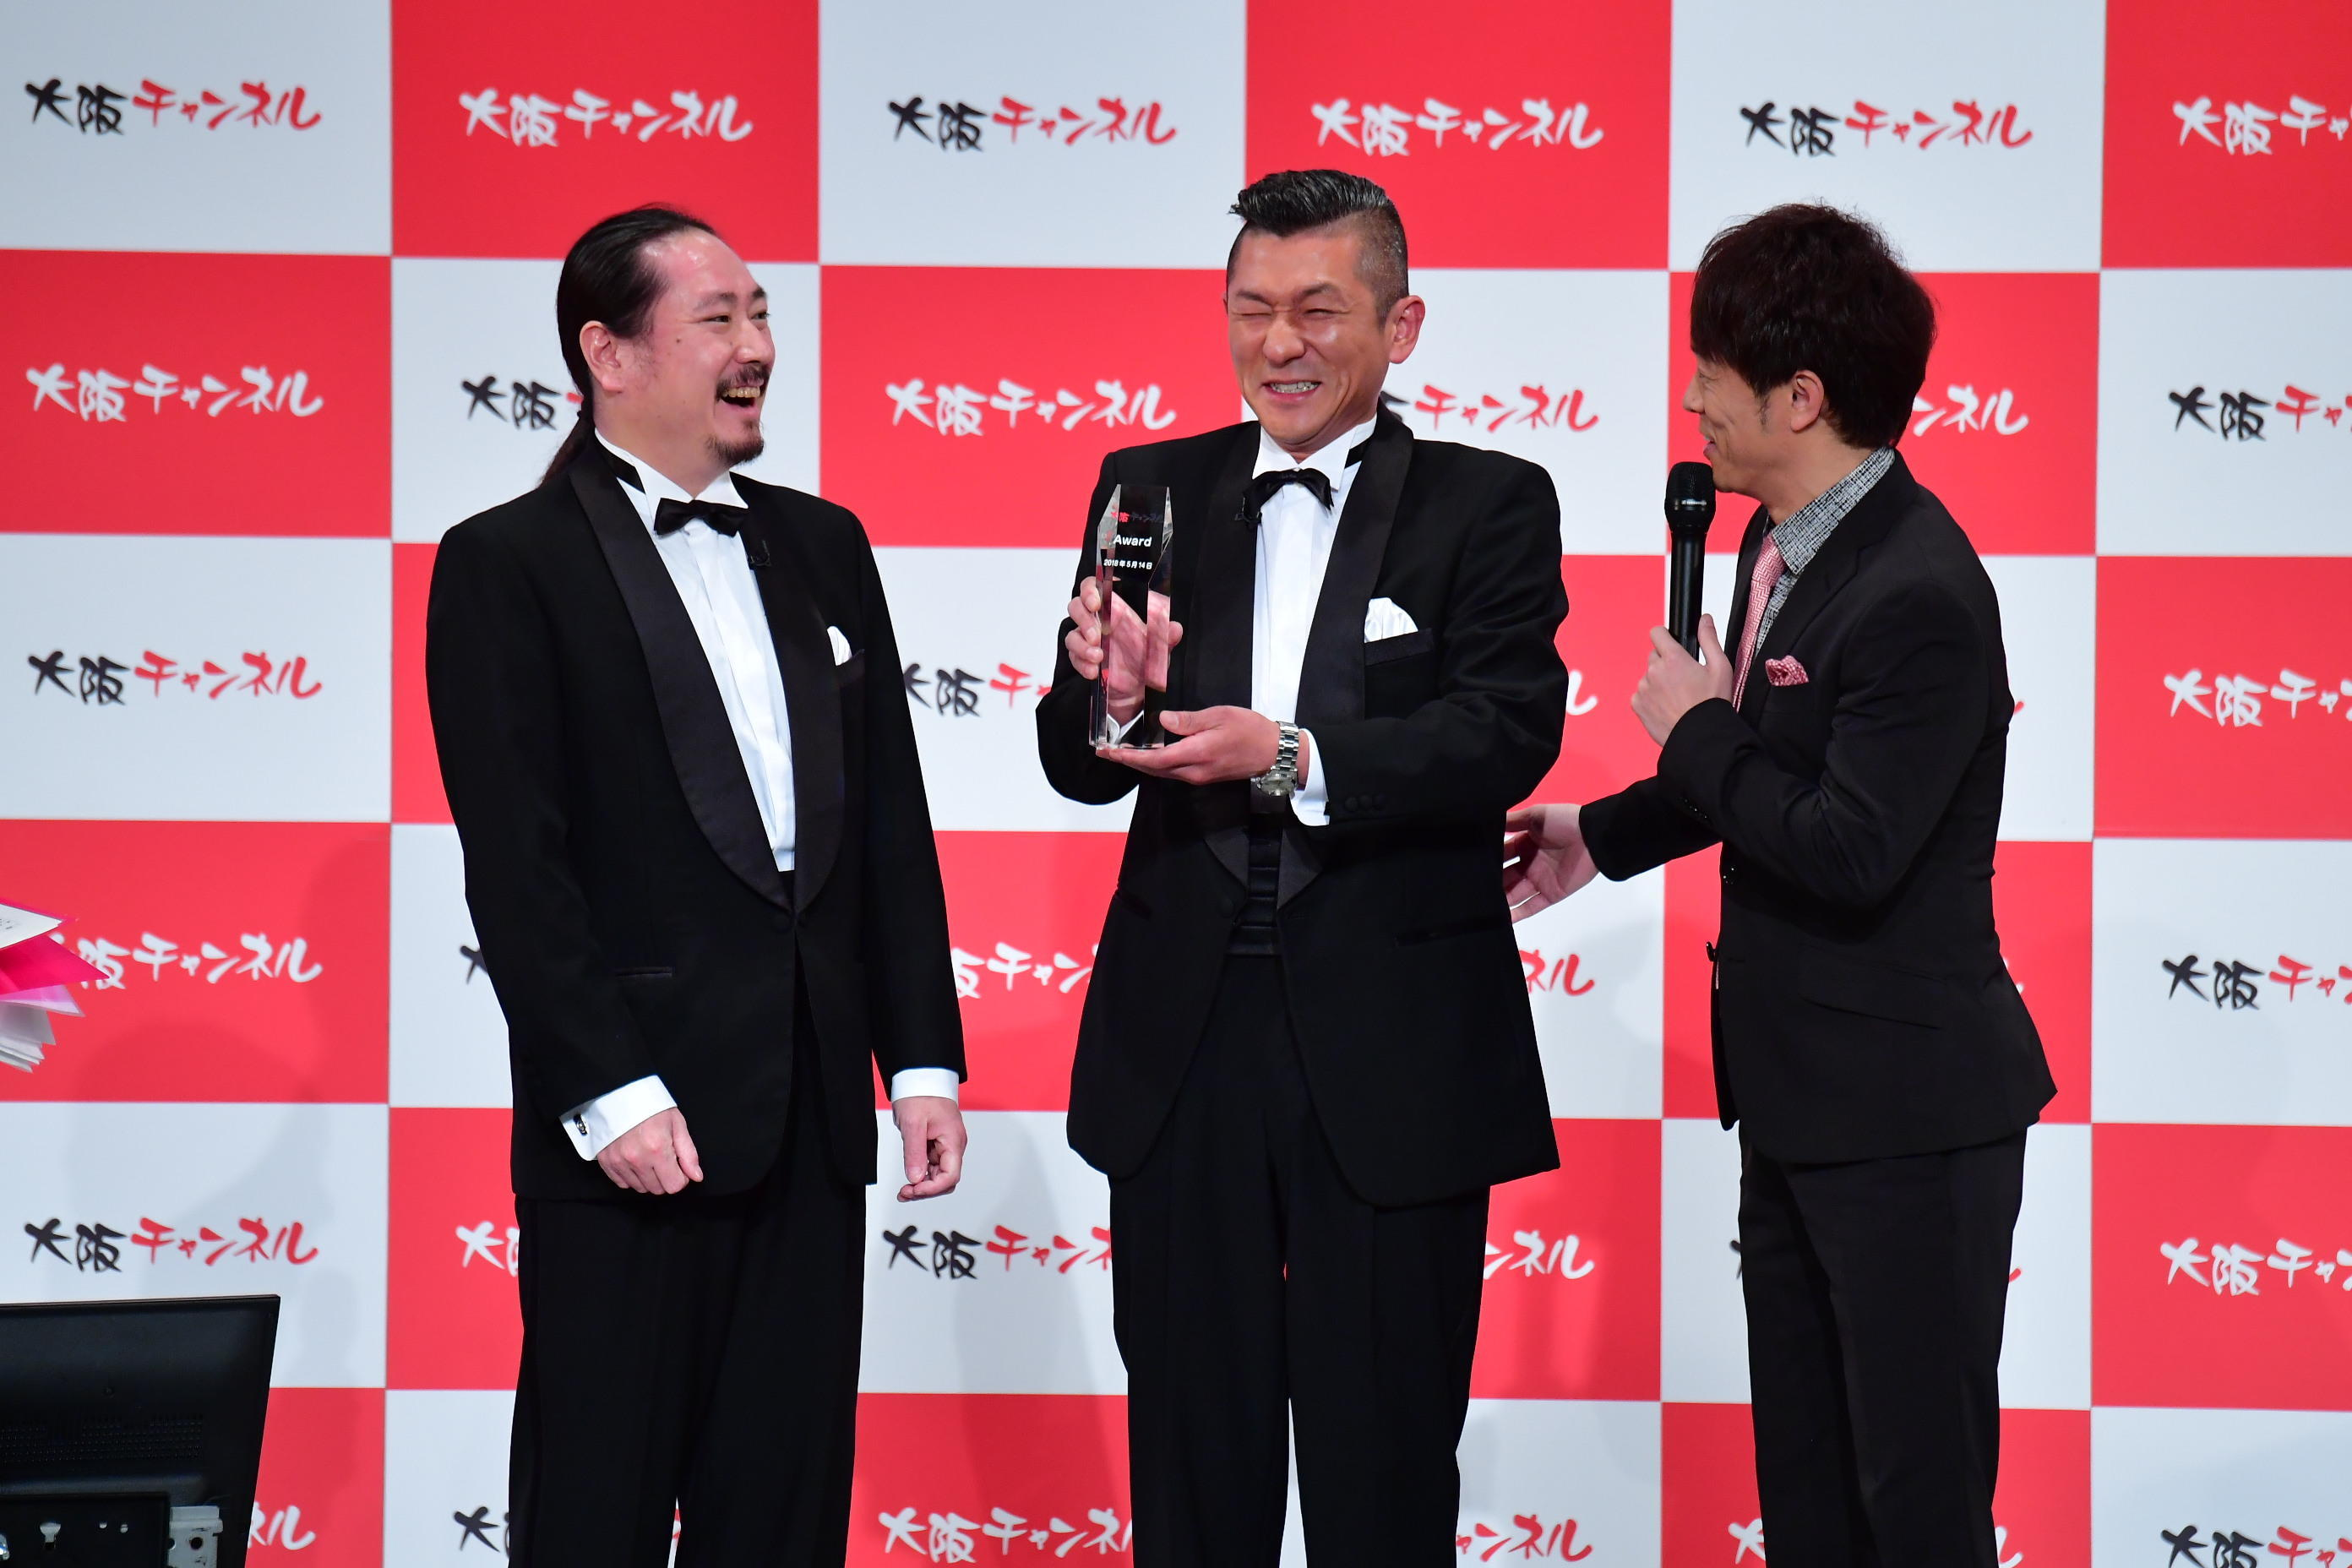 http://news.yoshimoto.co.jp/20180514224112-d1d8945f12c3206189f29497b40019a50c0f4e64.jpg